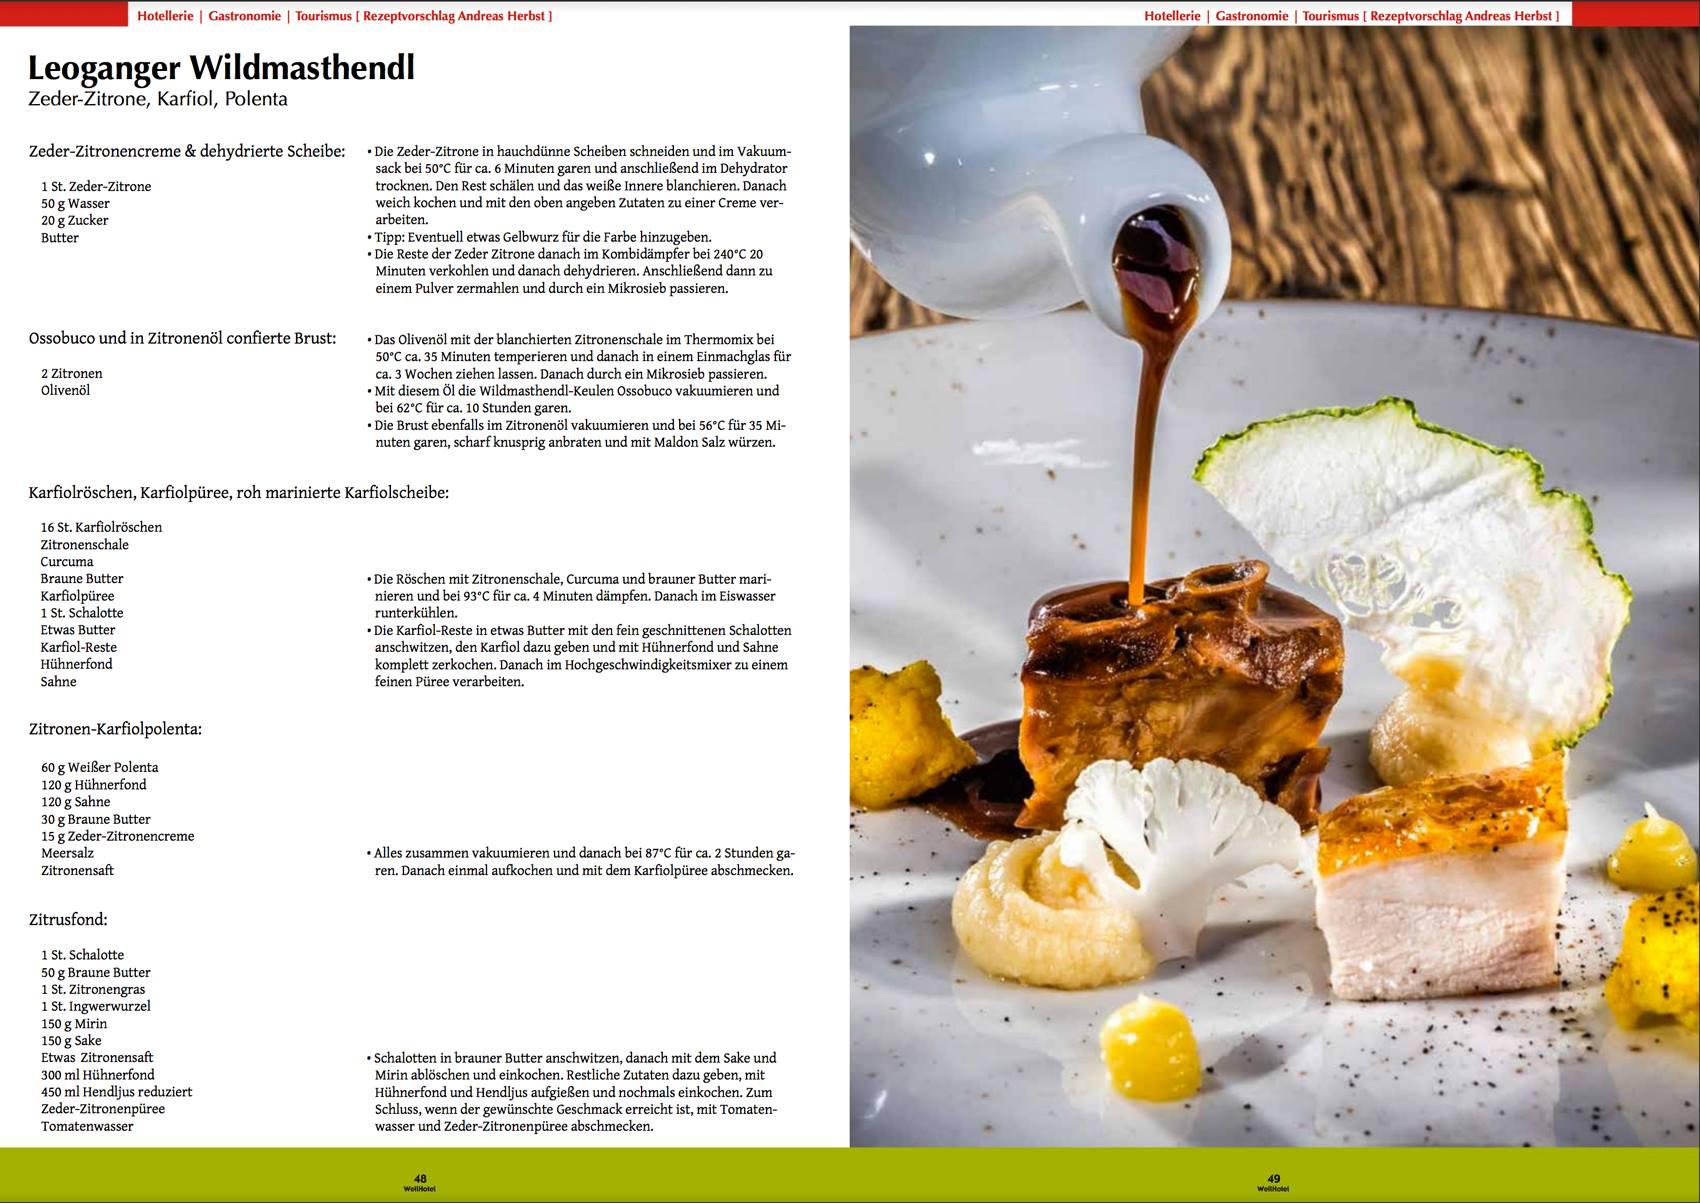 Foodpicture, Foodfoto, Lorenz Masser, Fotograf Land Salzburg